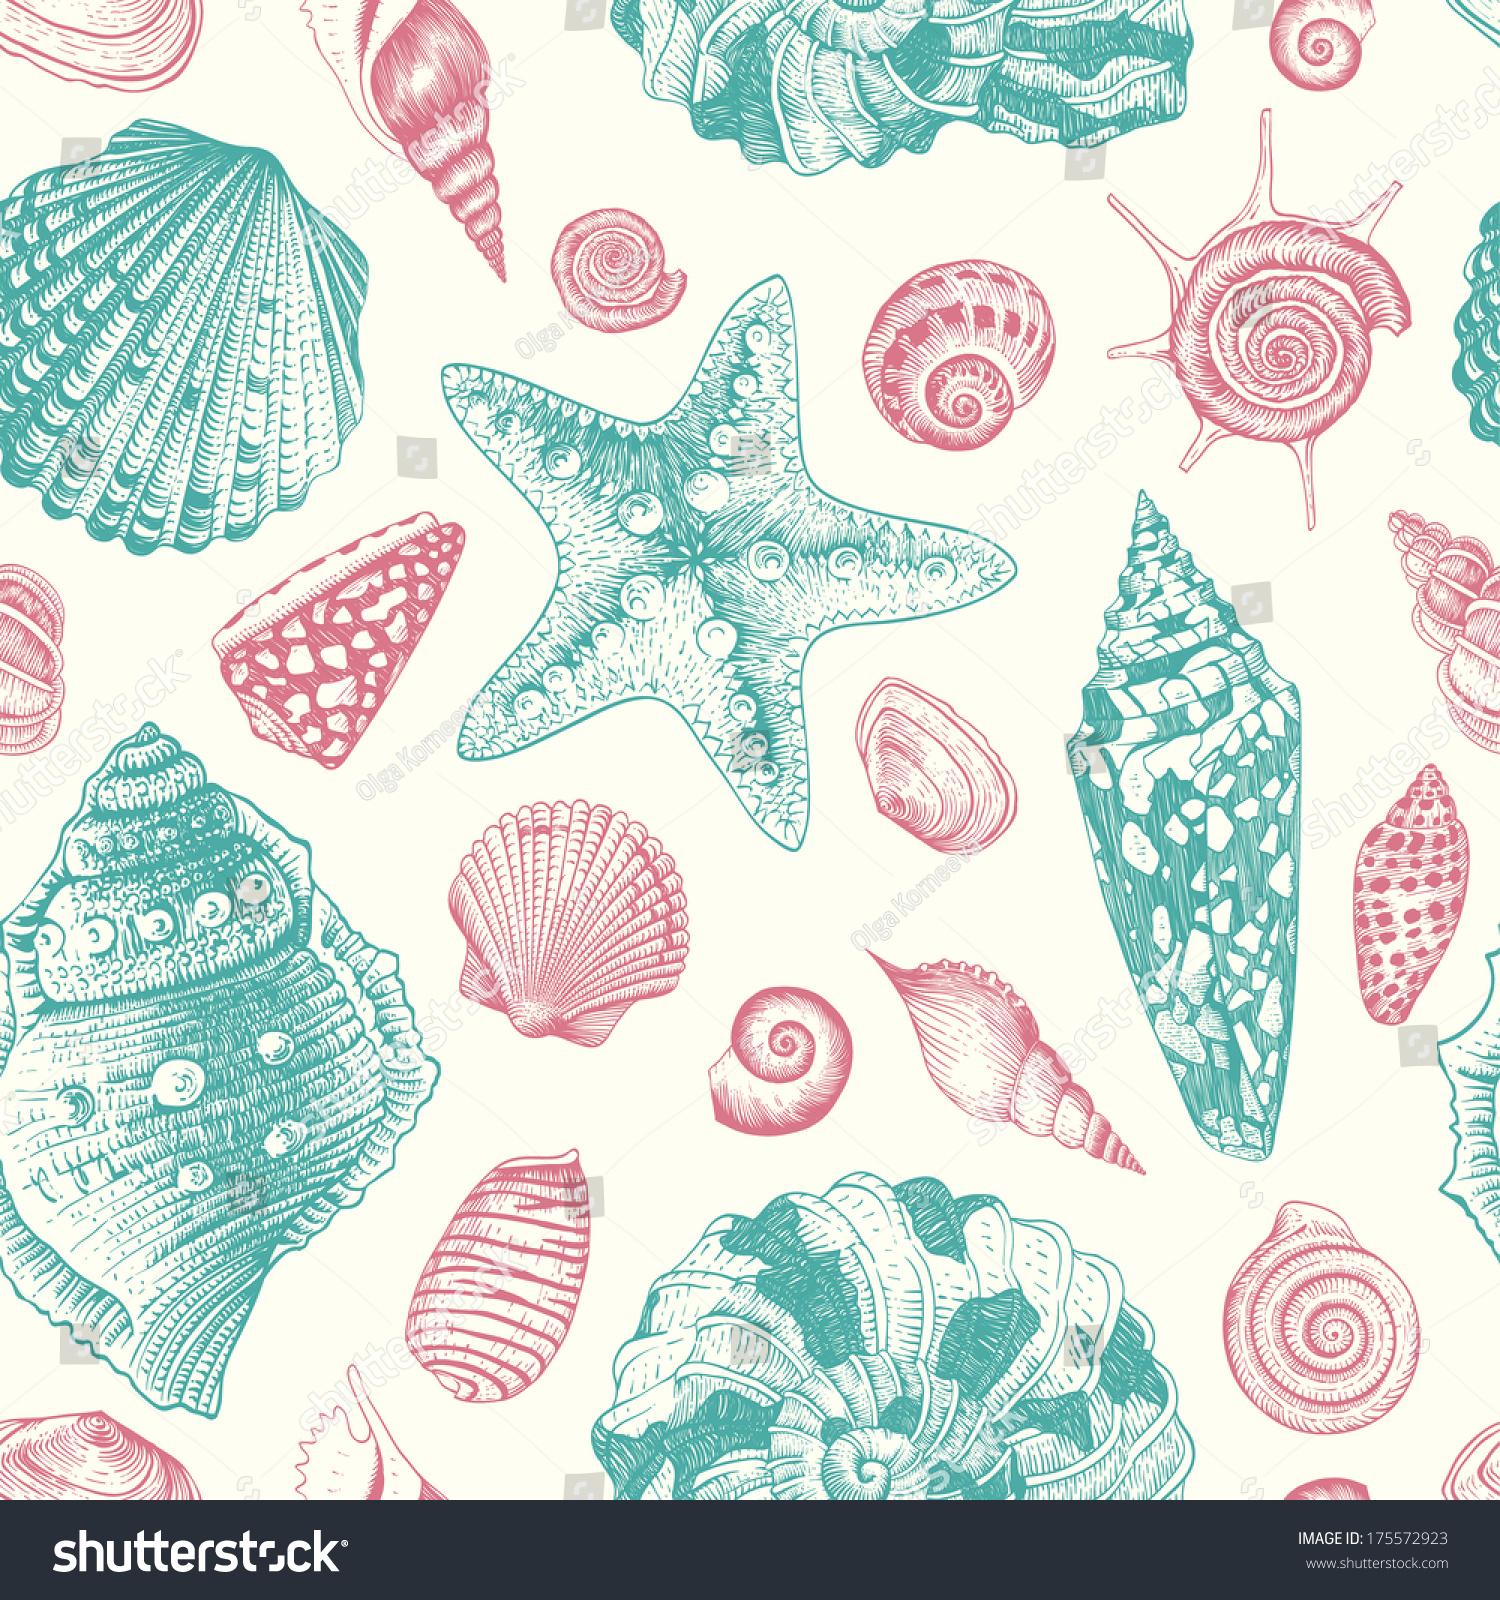 Vintage pastel pattern - photo#39